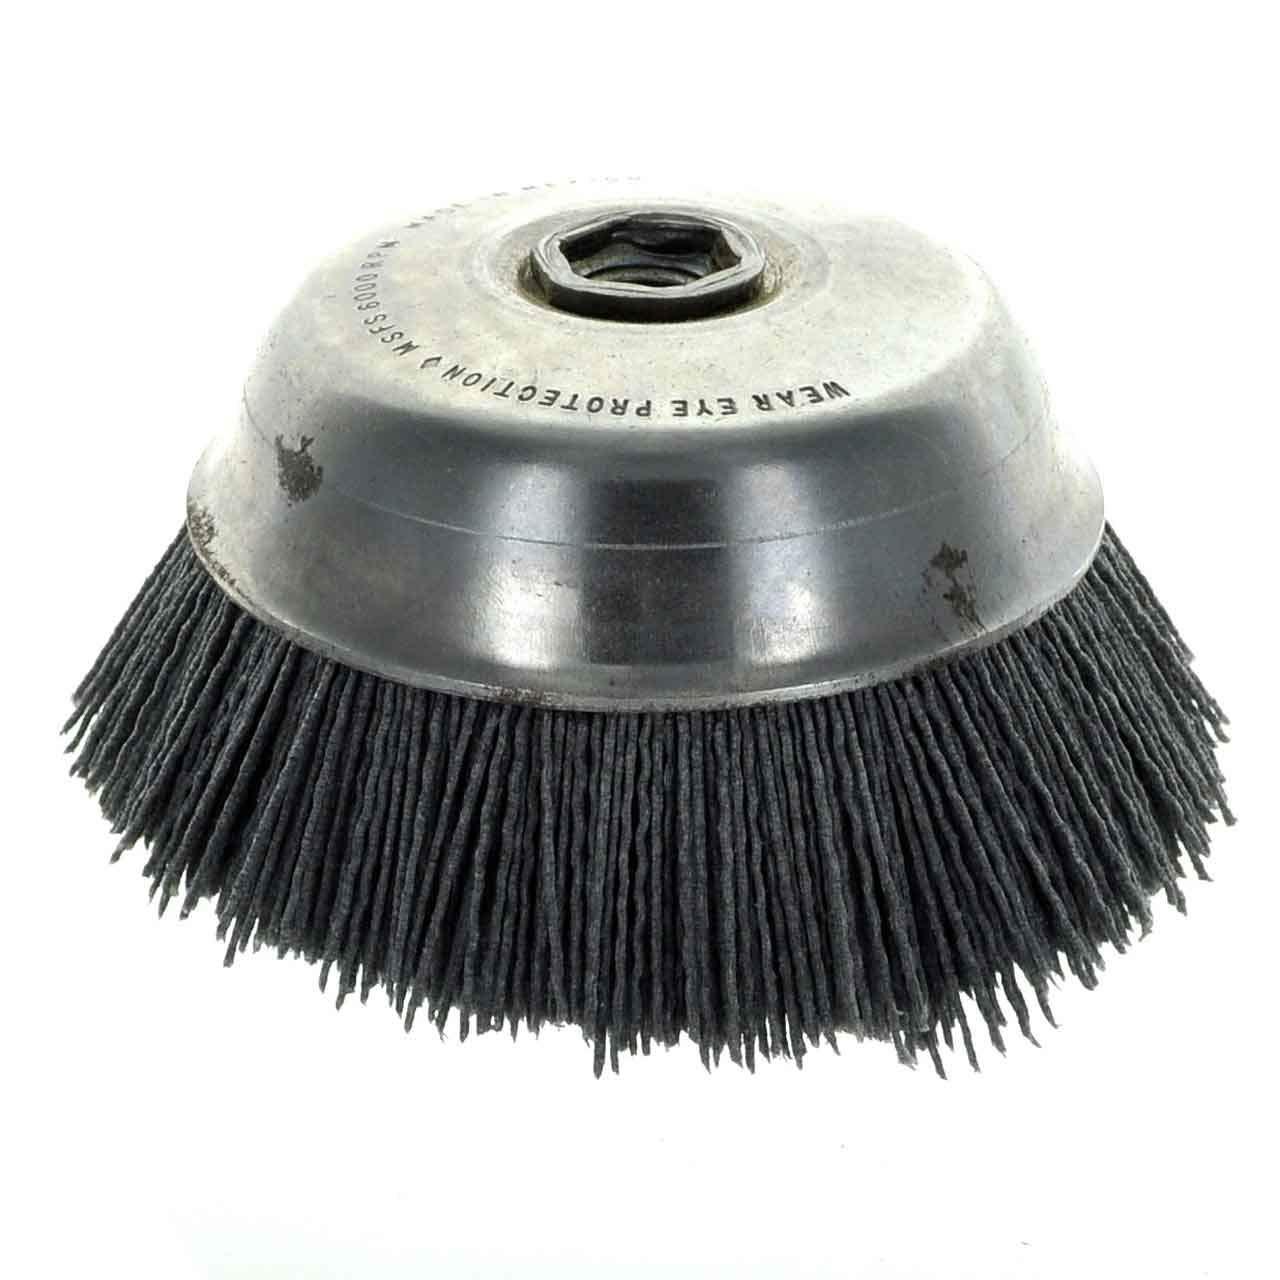 United Abrasives-SAIT 04340 6-Inch Nylon Cup Brush with 80X Grit, 1-Pack by United Abrasives- SAIT